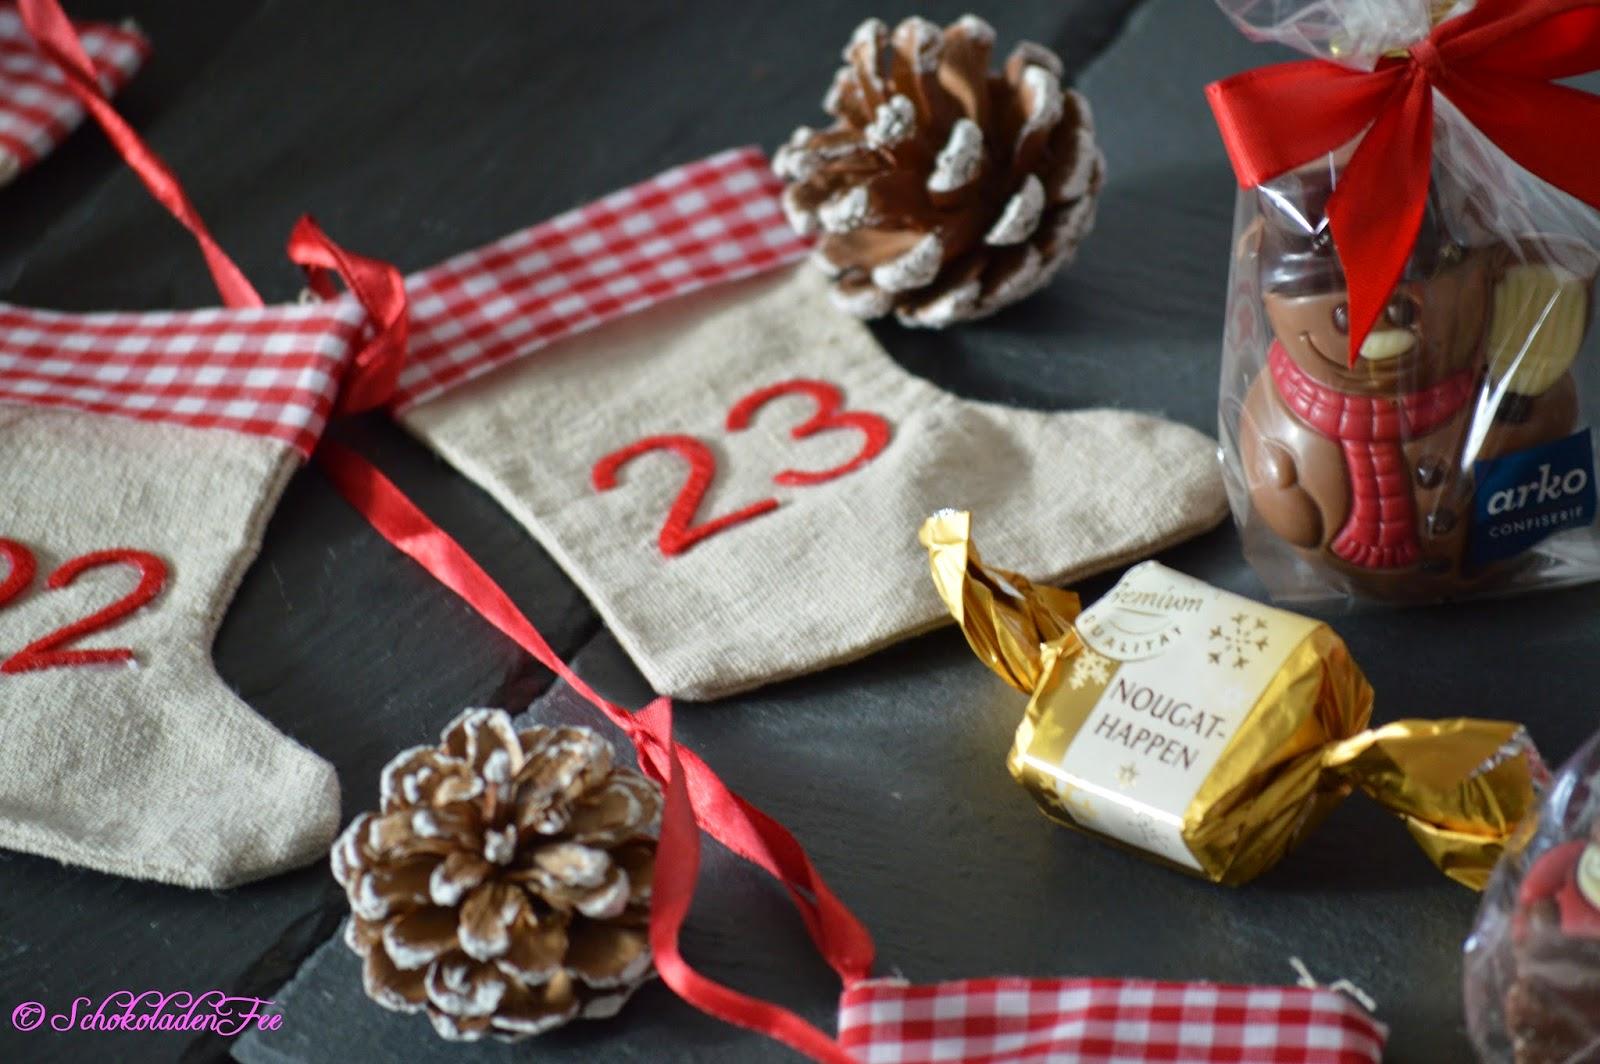 http://schokoladen-fee.blogspot.de/2014/11/produktbericht-arko-adventskalender.html